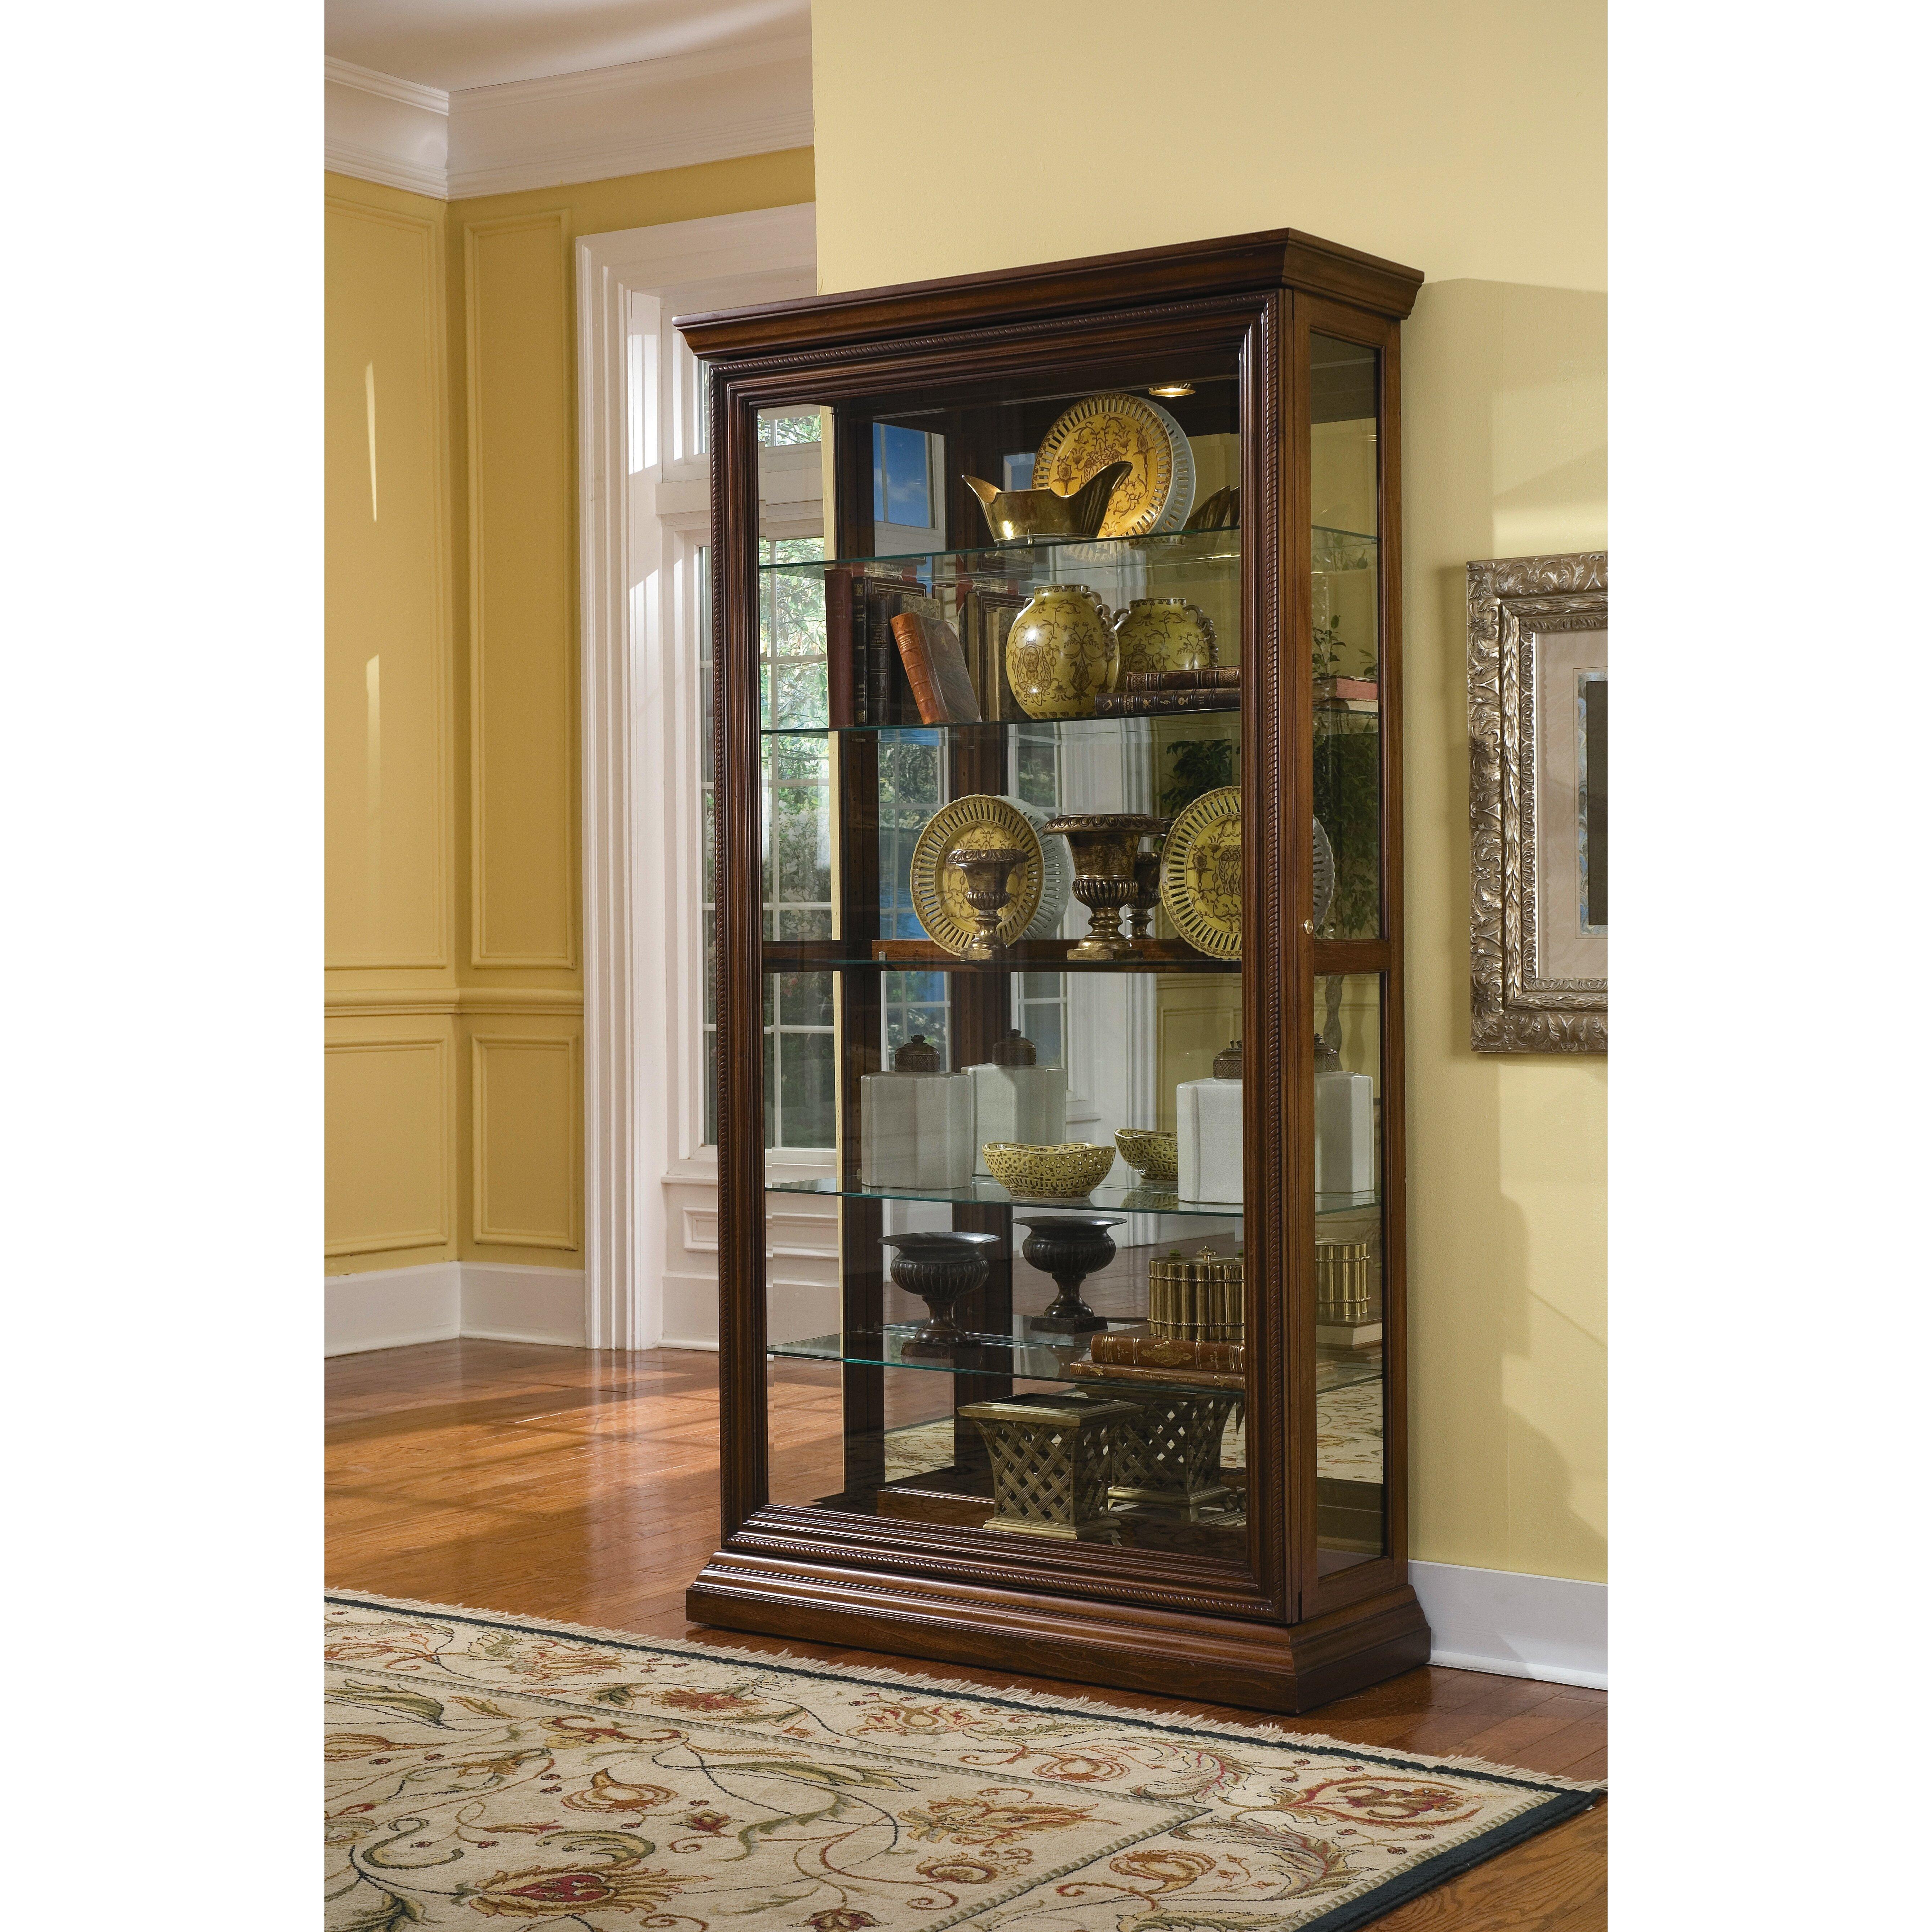 Darby home co purvoche curio cabinet reviews wayfair for Curio cabinet